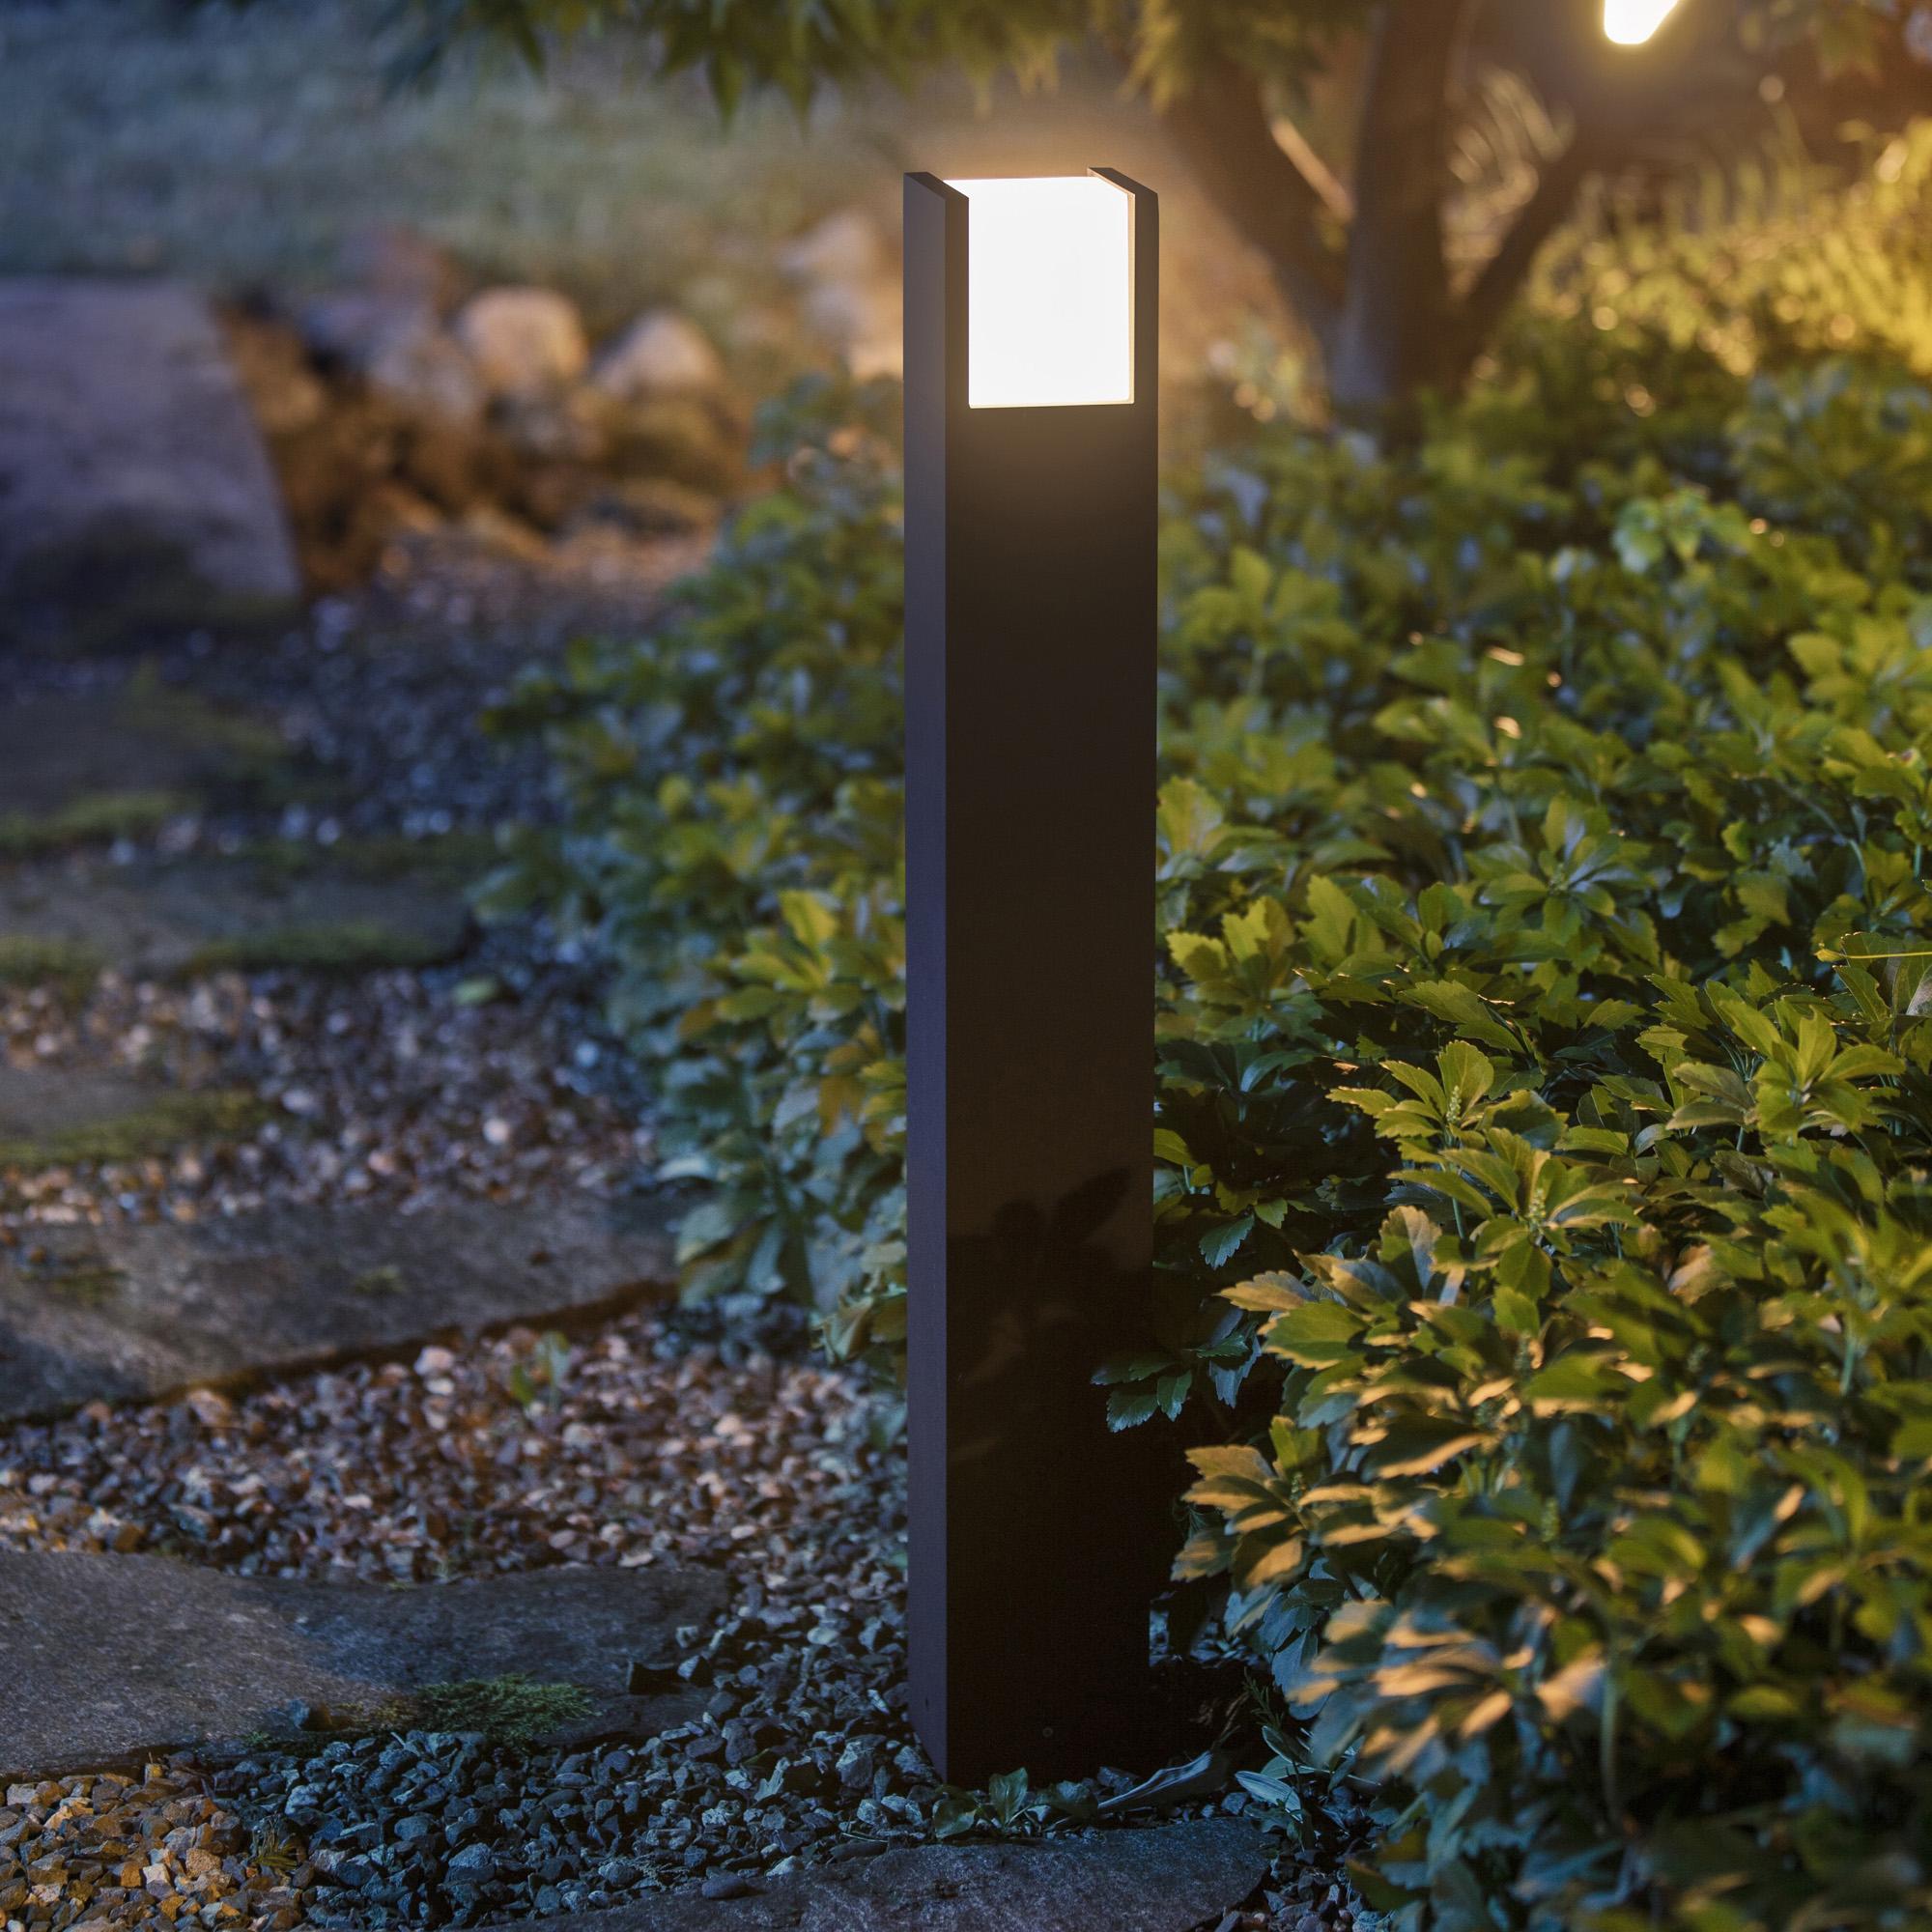 Philips Hue White Fuzo LED-Wegeleuchte, schwarz 1744830P7